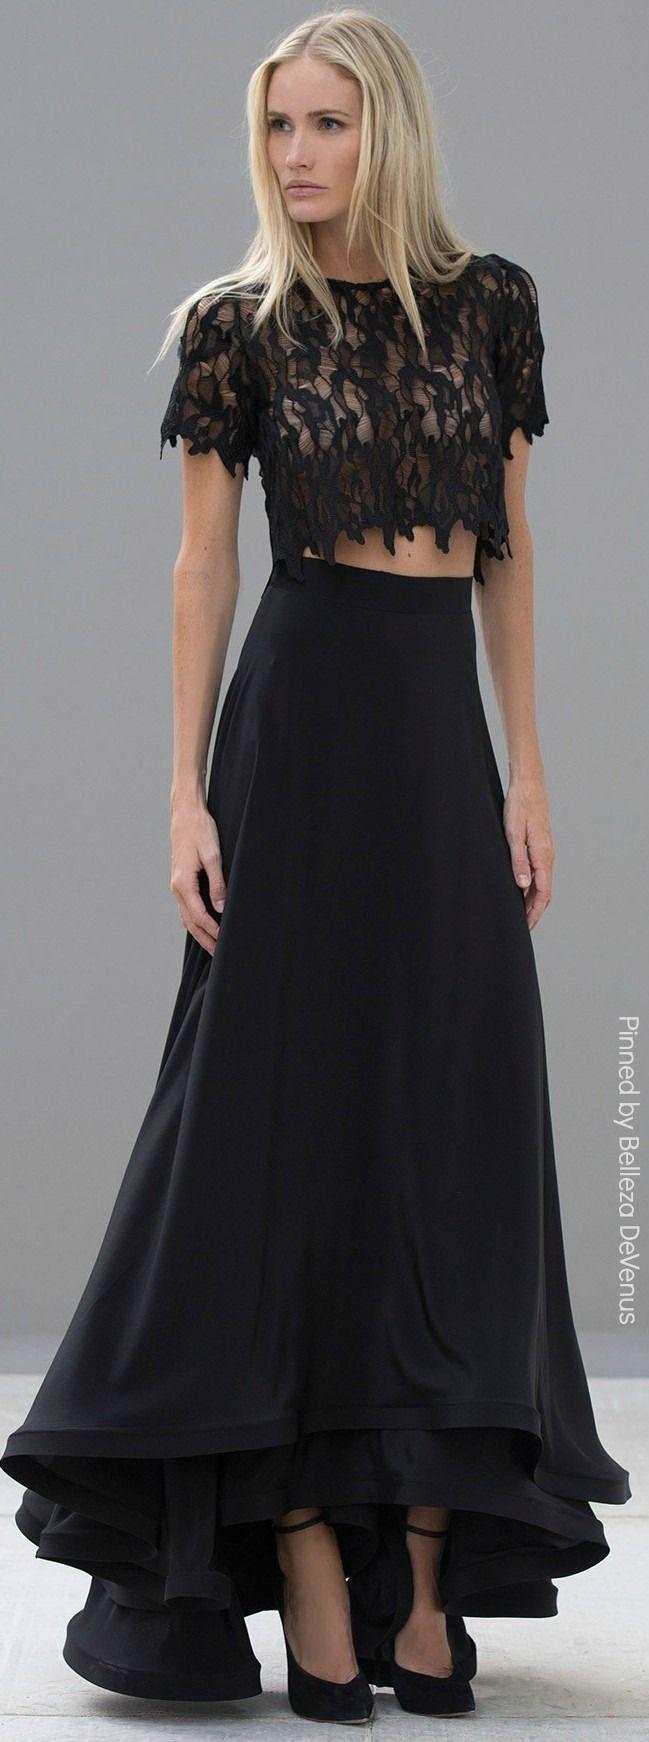 Best 20+ Black maxi skirt outfit ideas on Pinterest   Summer maxi ...